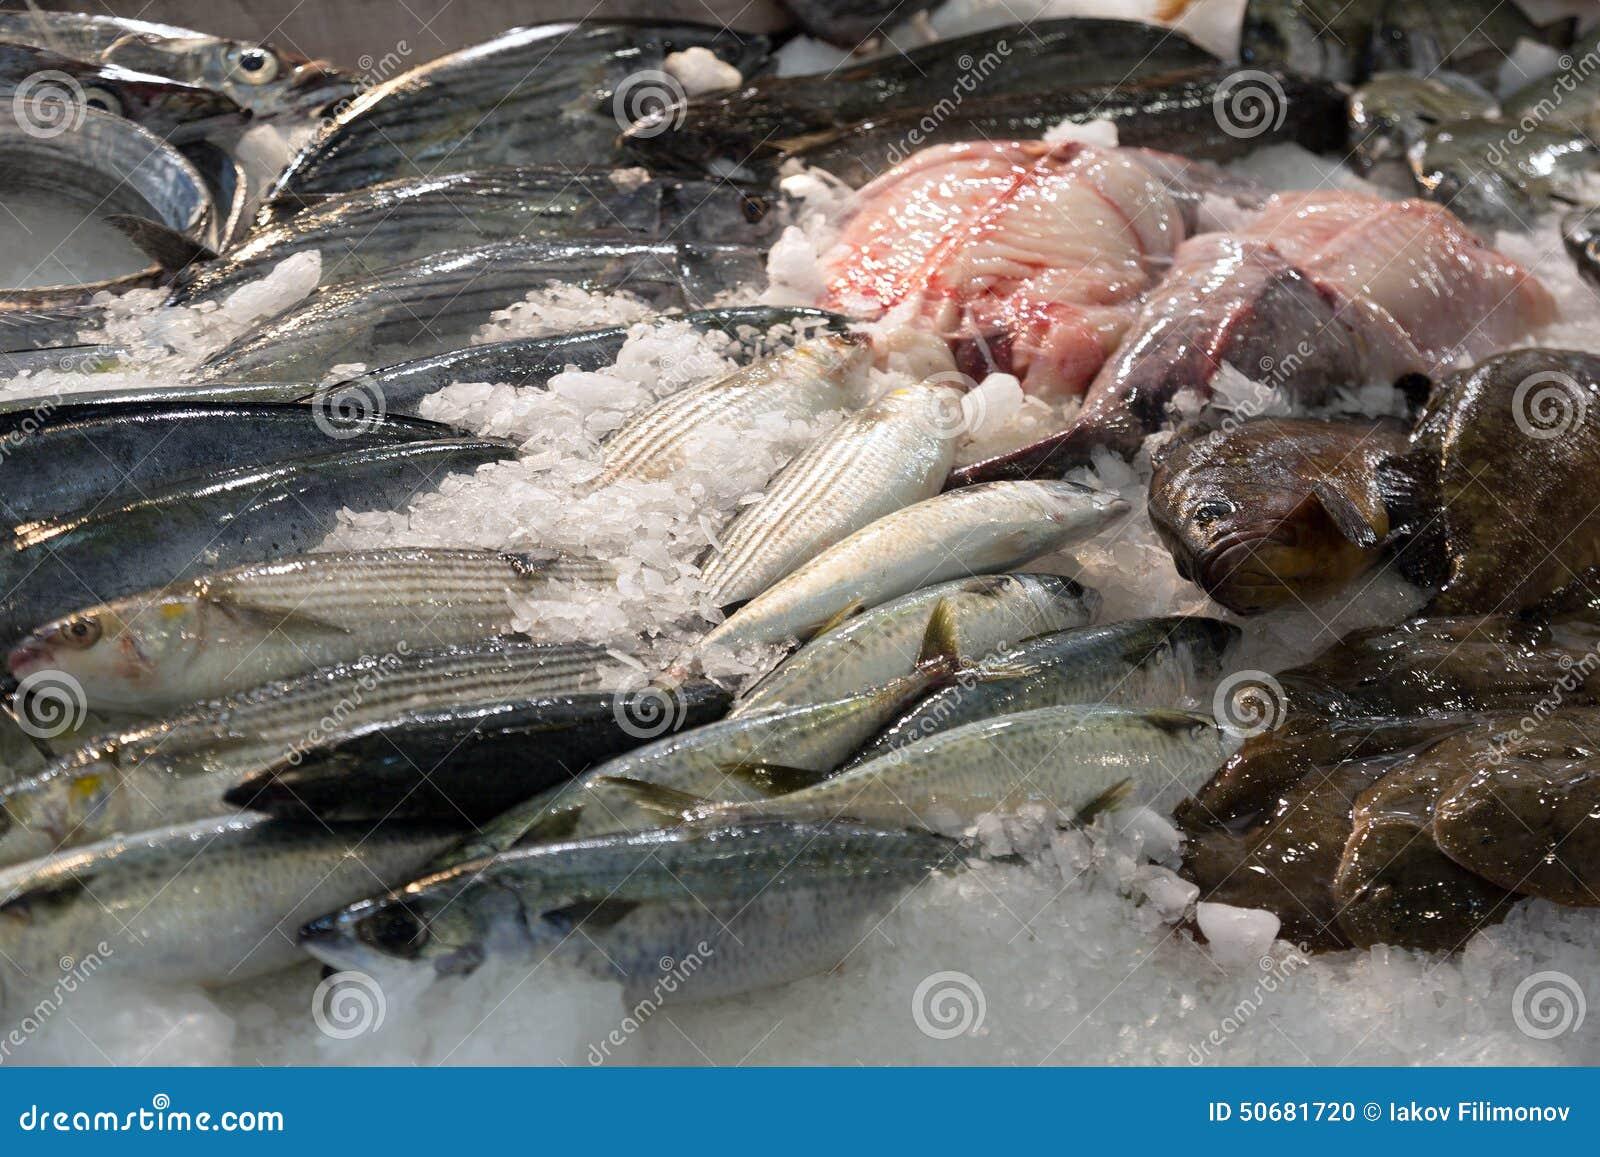 Download 在地中海市场柜台的鱼 库存照片. 图片 包括有 海洋, 未煮过, 市场, 界面, 许多, 新鲜, 销售额 - 50681720